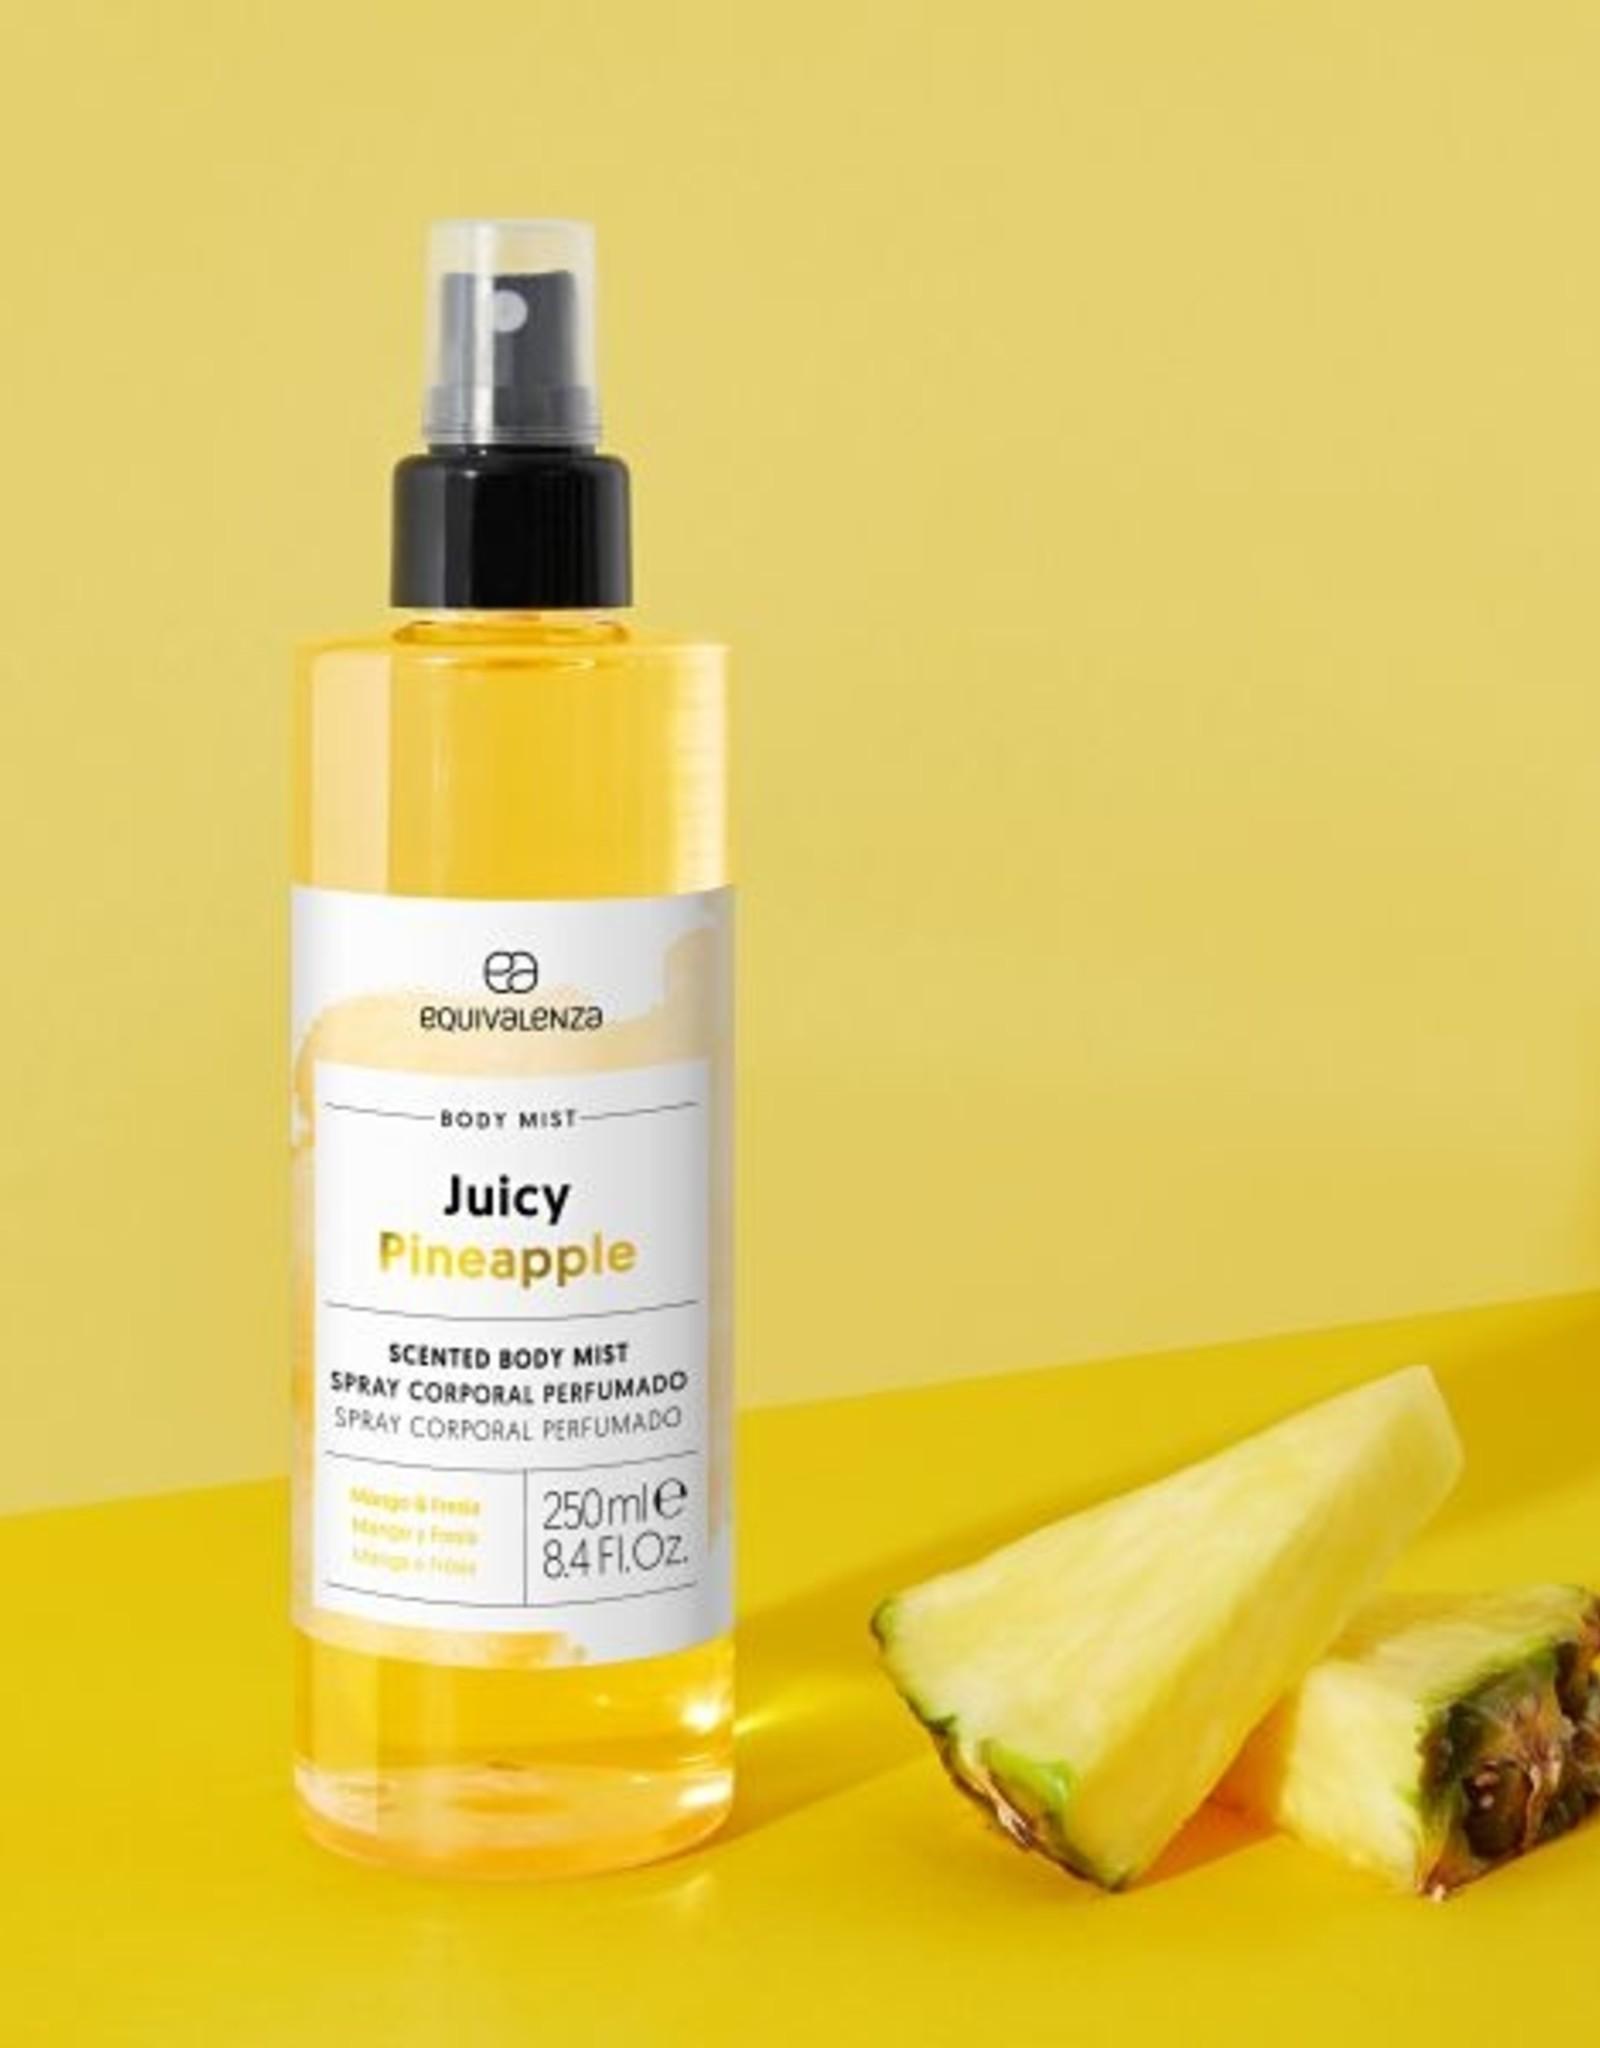 Equivalenza Juicy Pineapple Body Mist